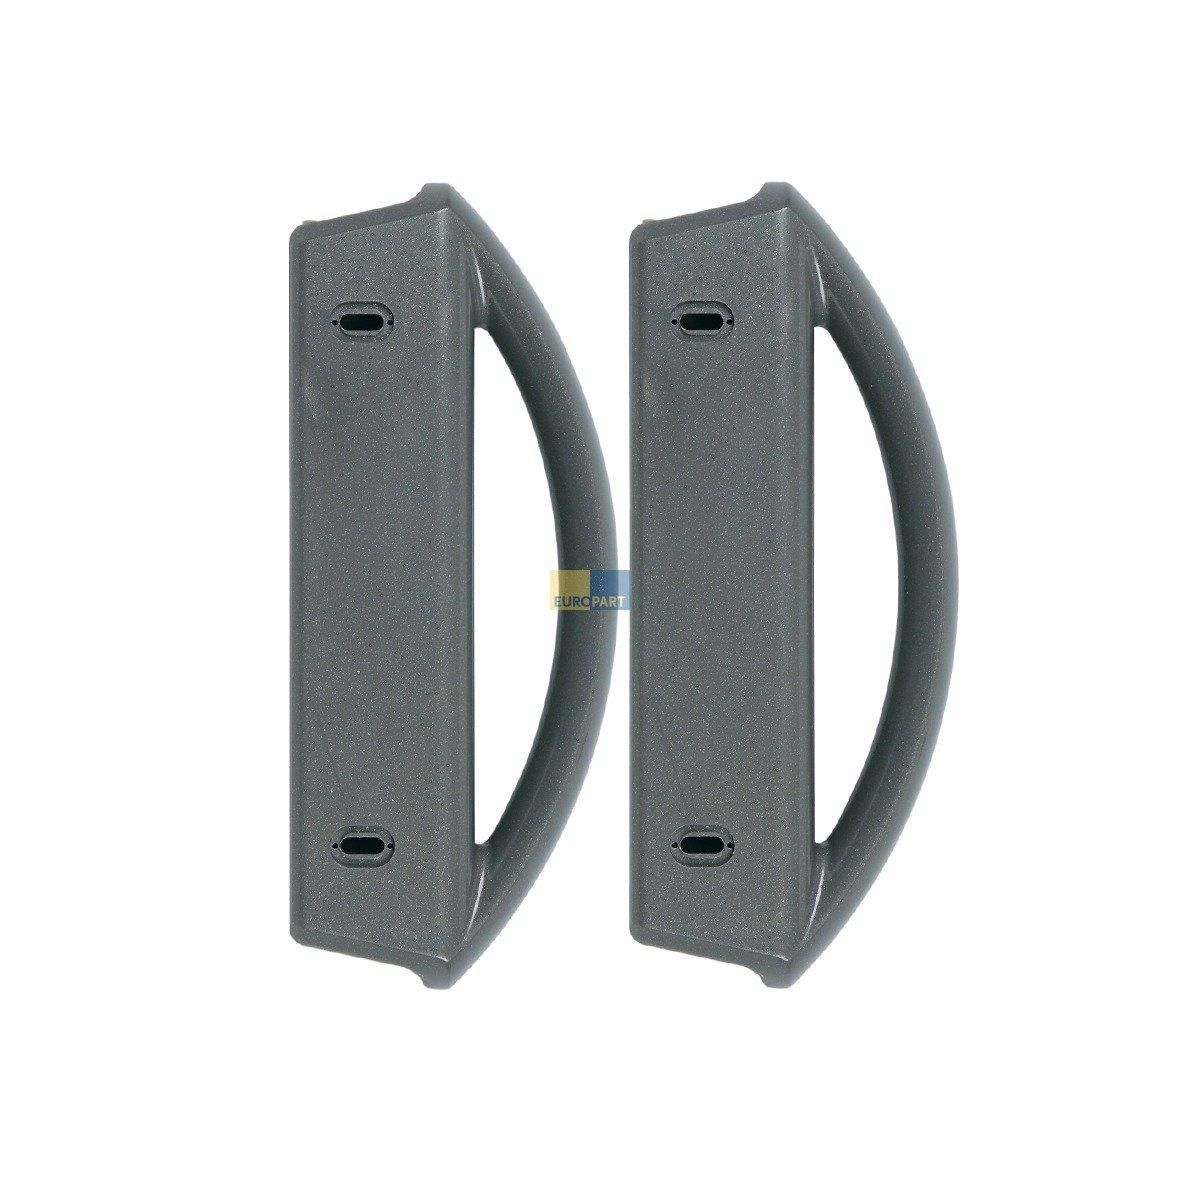 Electrolux AEG 50299864004 ORIGINAL T/ürgriff Handgriff Griff T/ür/öffner /Öffner 2 St/ück K/ühlschrank auch Zanker